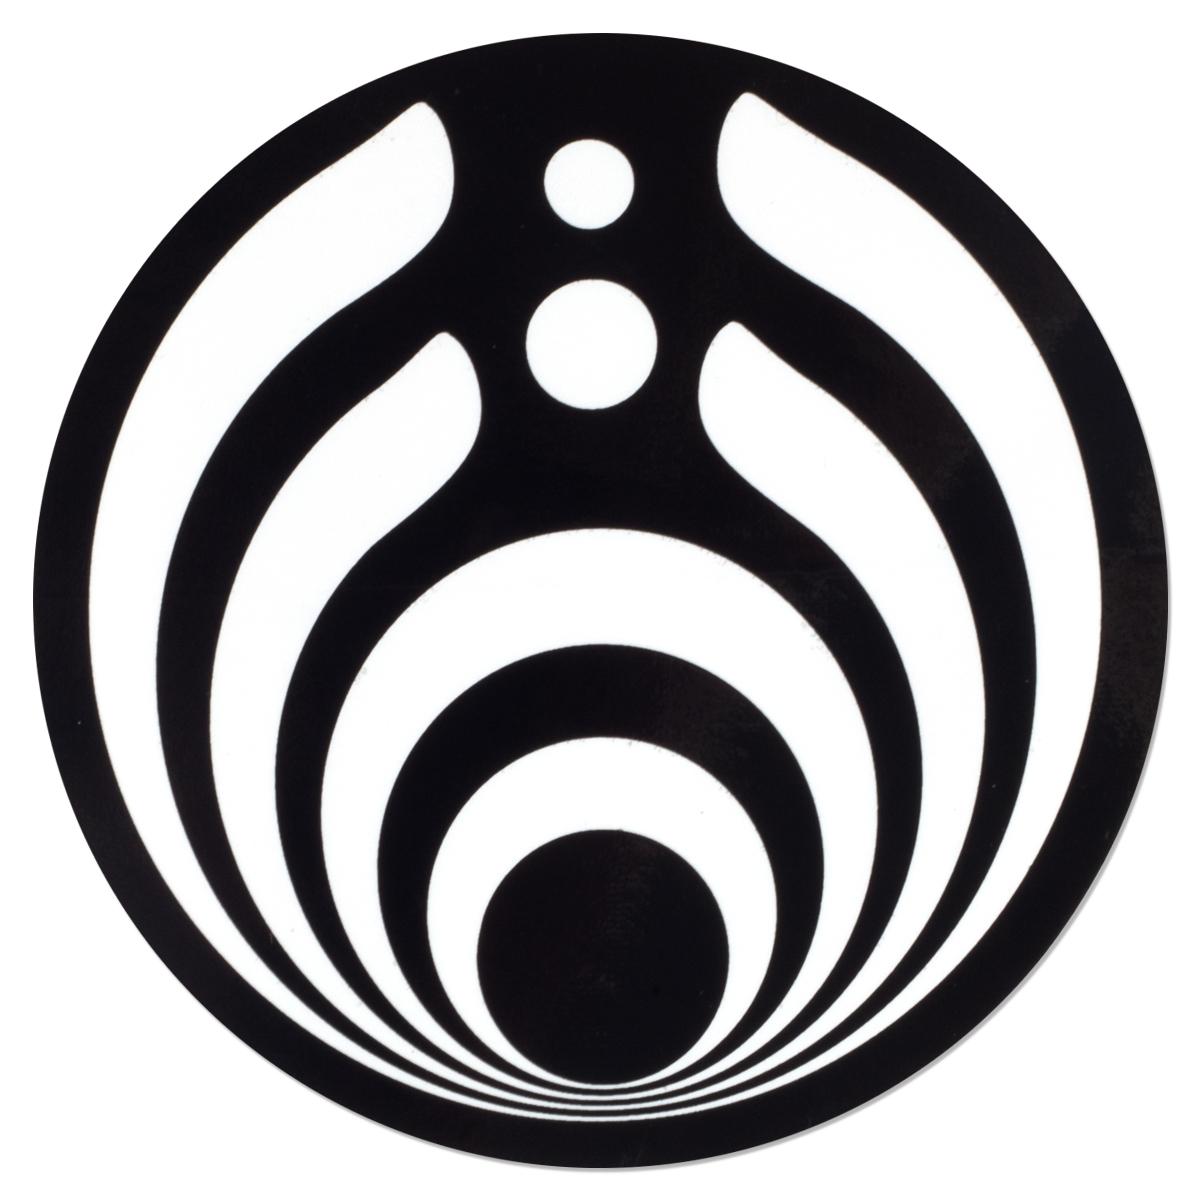 Black and White Emblem Sticker